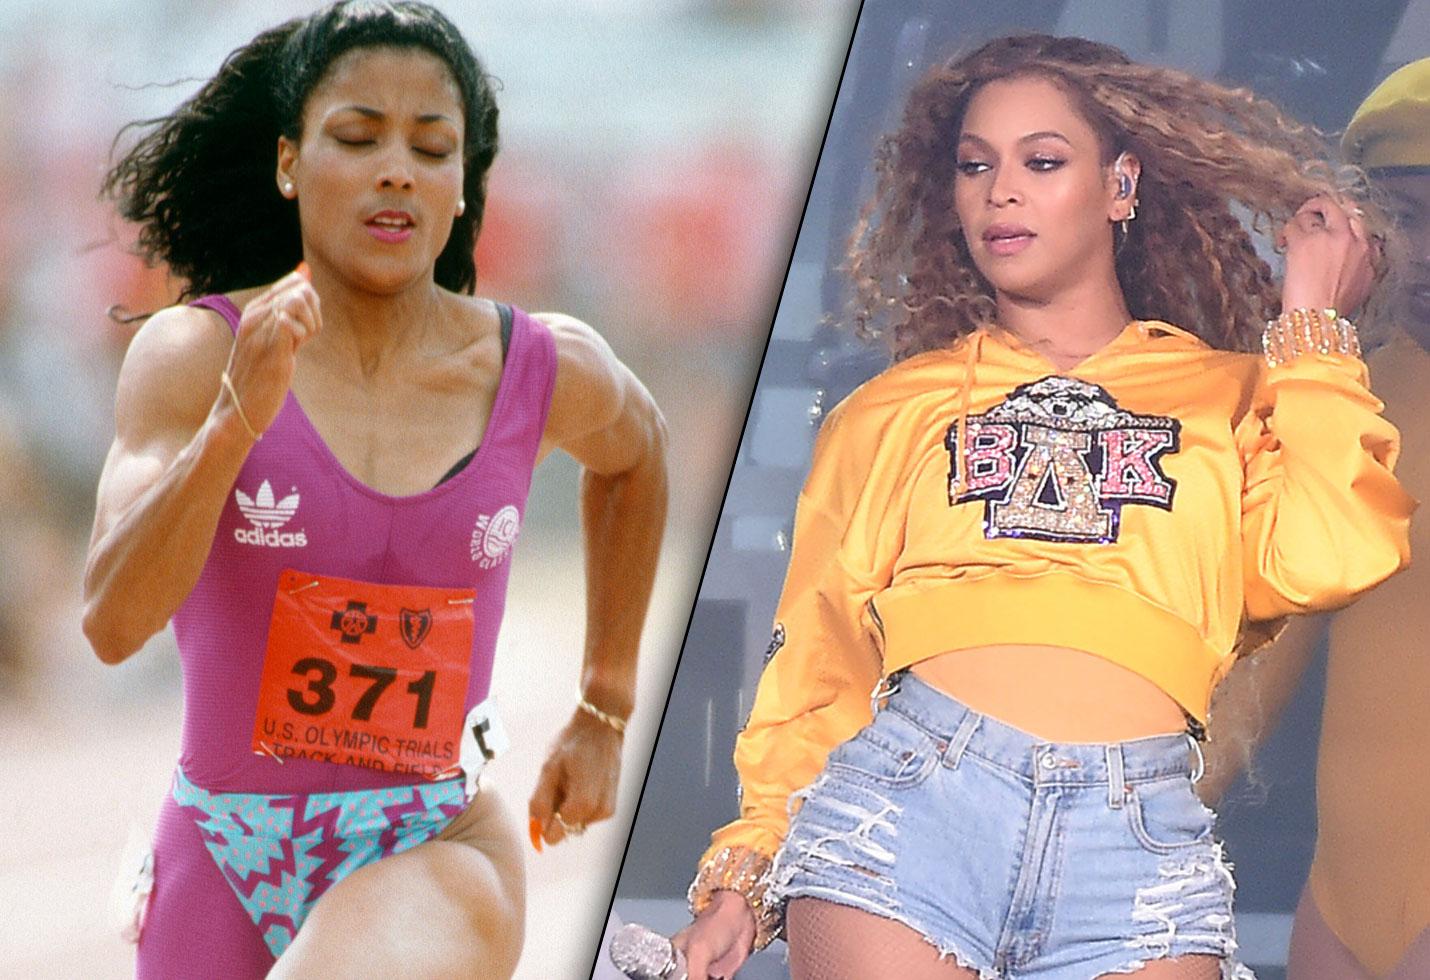 Beyonce Flo Jo Jay Z Tommie Smith Halloween Costumes 2018 Florence Griffith Joyner Olympics